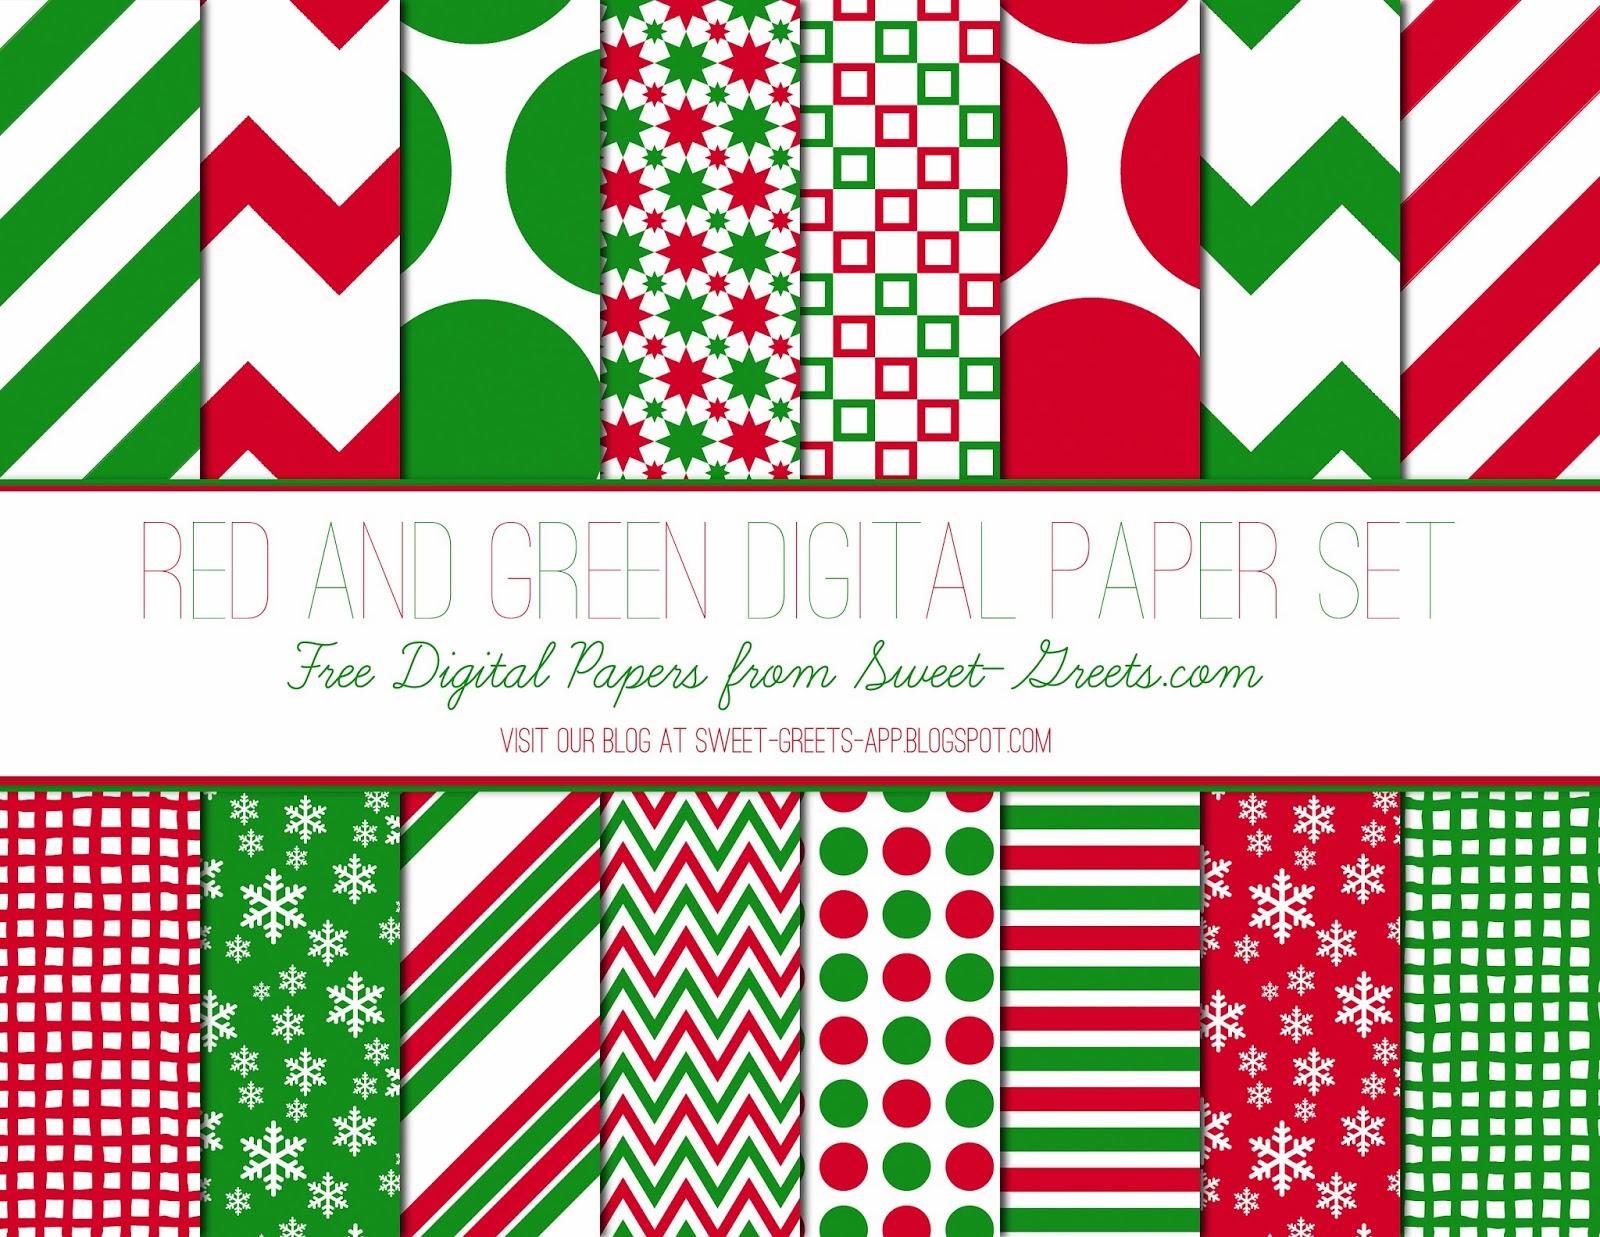 Printable paper backgrounds christmas - Jpg 1600x1237 Christmas Digital Scrapbook Background